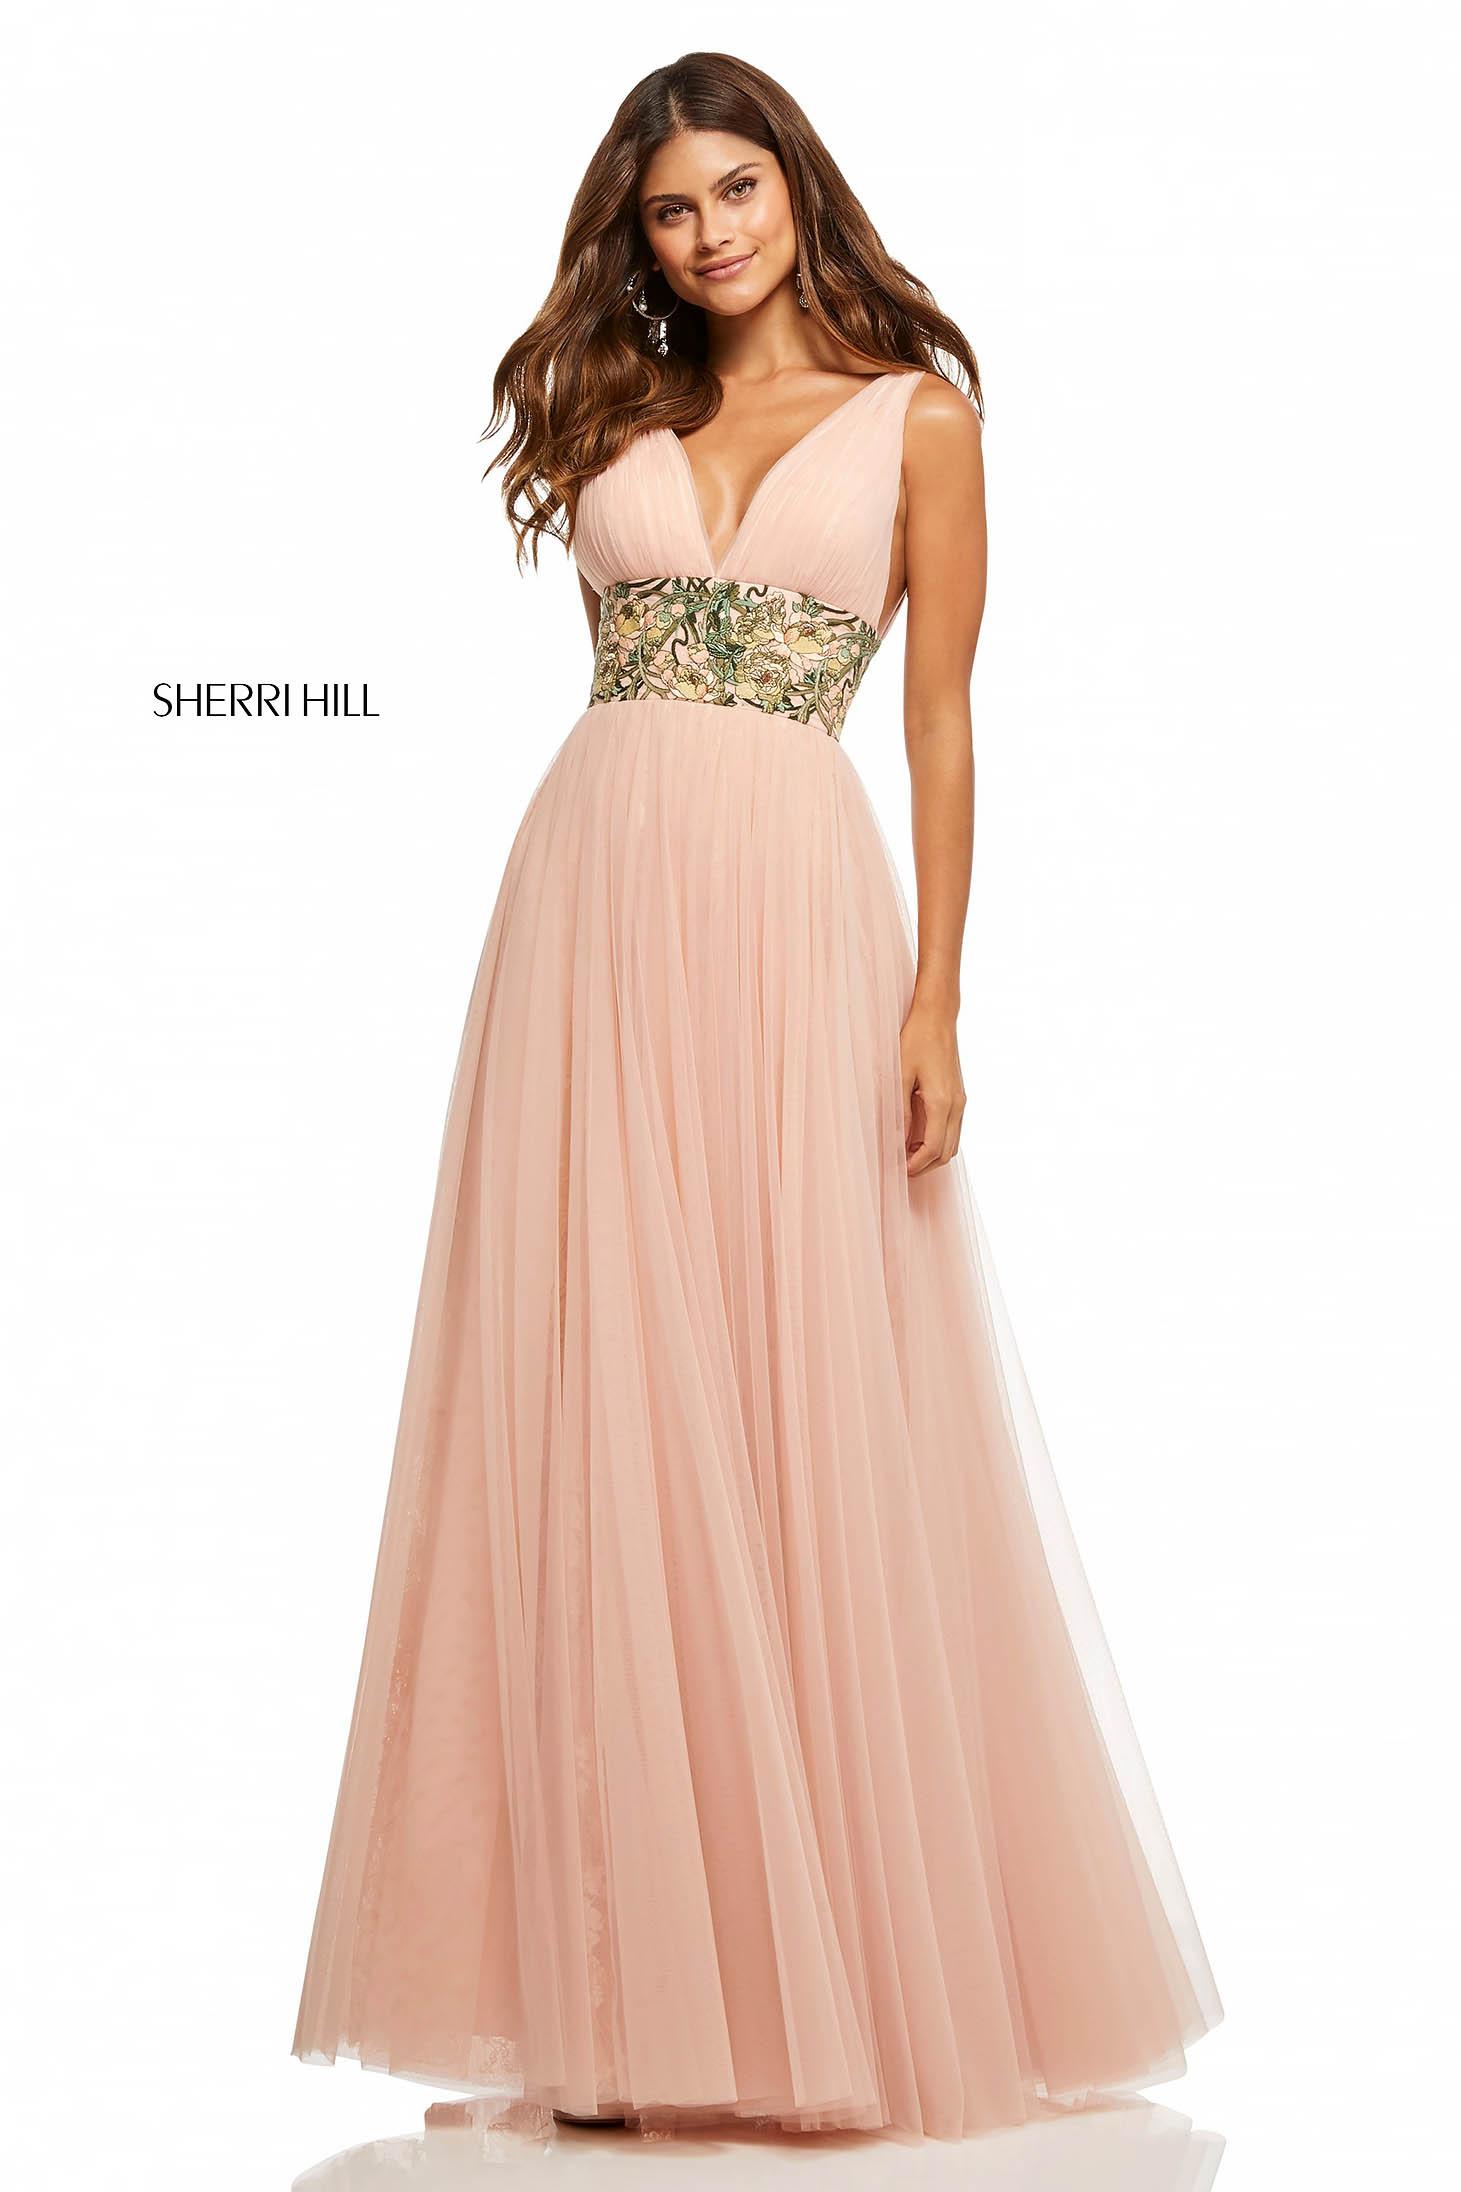 Sherri Hill 52670 LightPink Dress